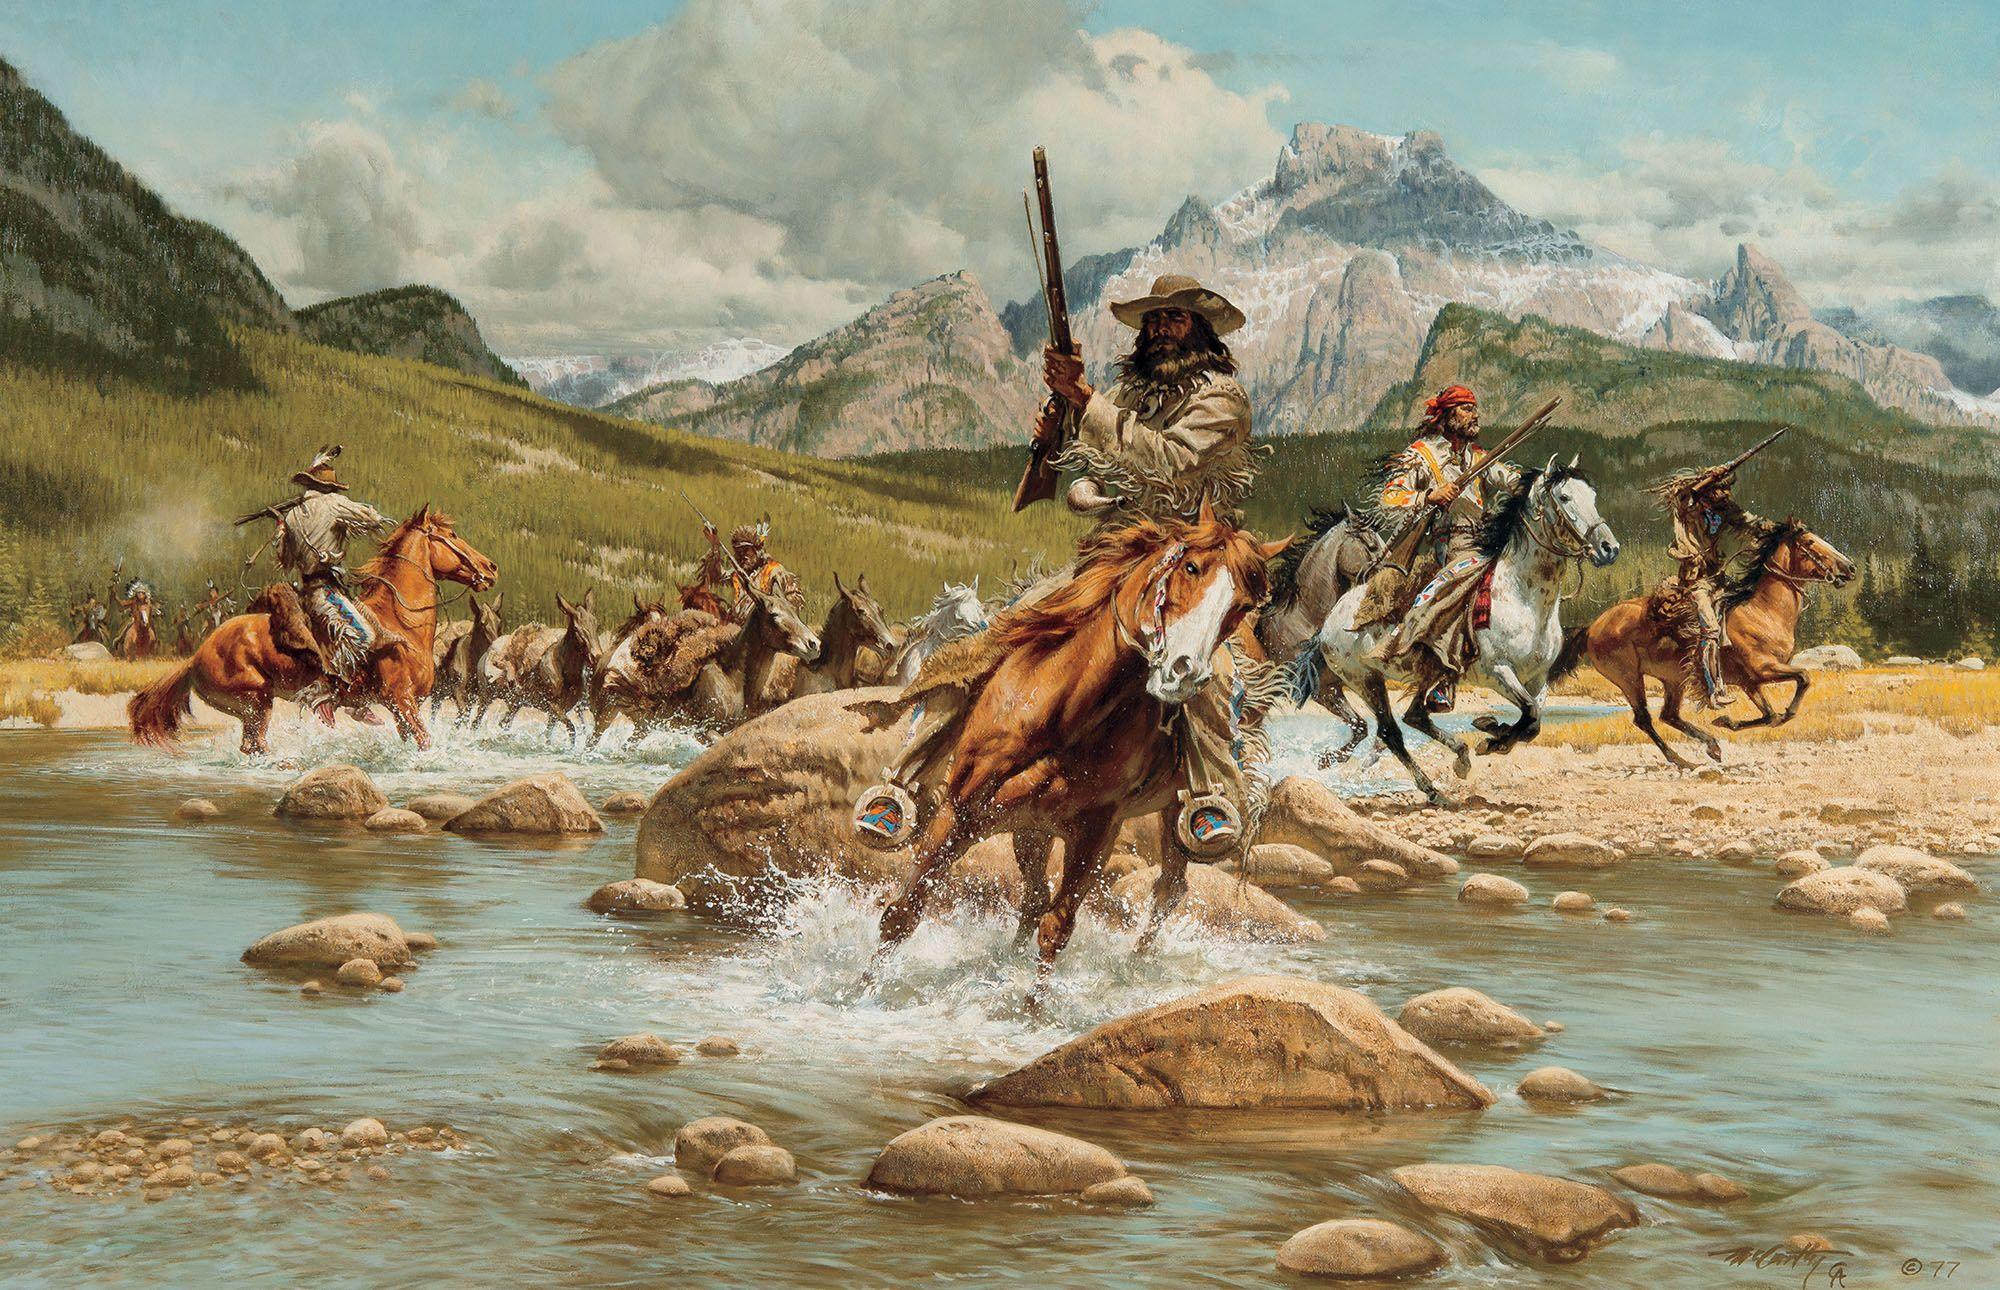 Pin Francisco Lopez Nativos Cowboy Art West